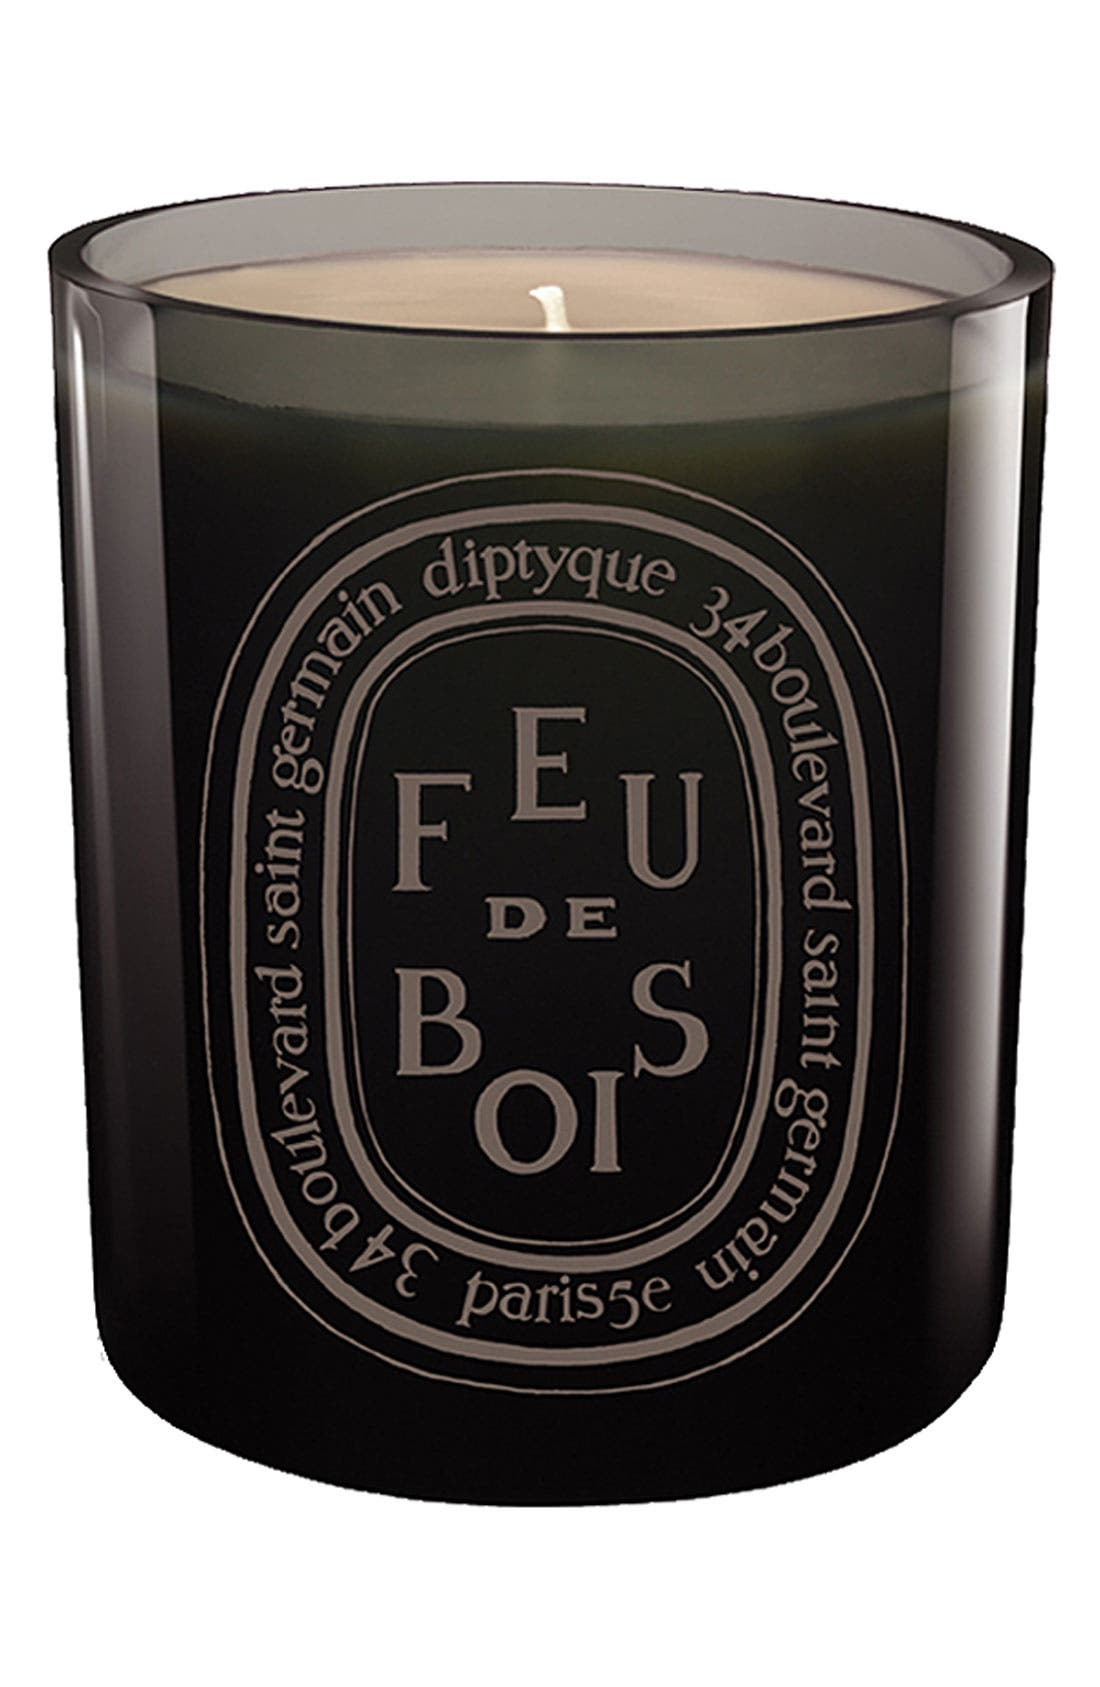 Alternate Image 1 Selected - diptyque Feu de Bois/Wood Fire Grey Scented Candle